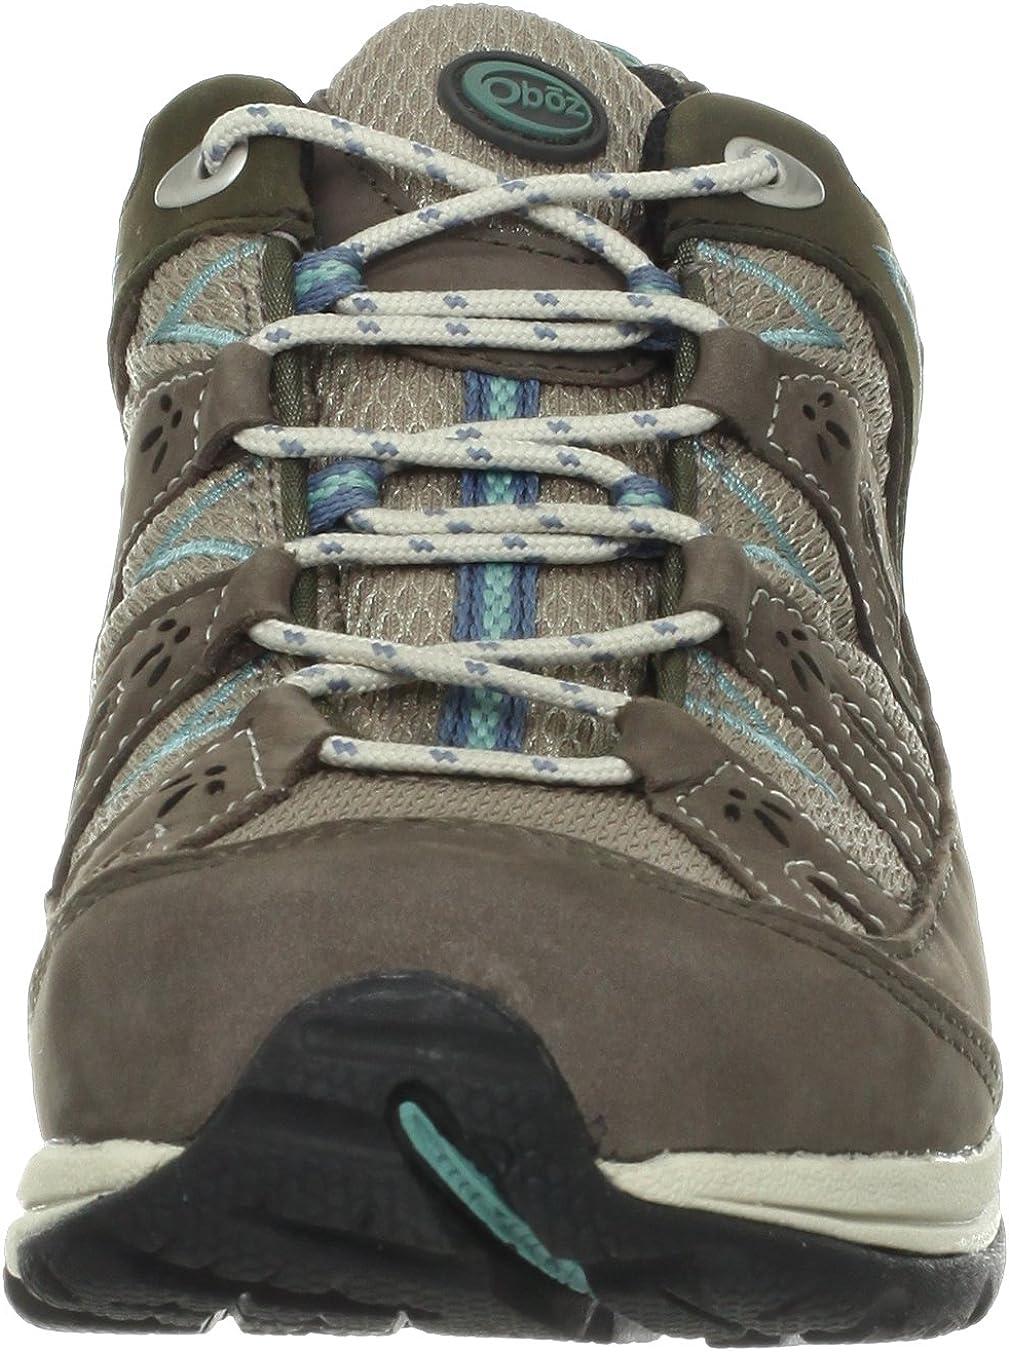 Oboz Womens Mystic Low BDRY Hiking Shoe